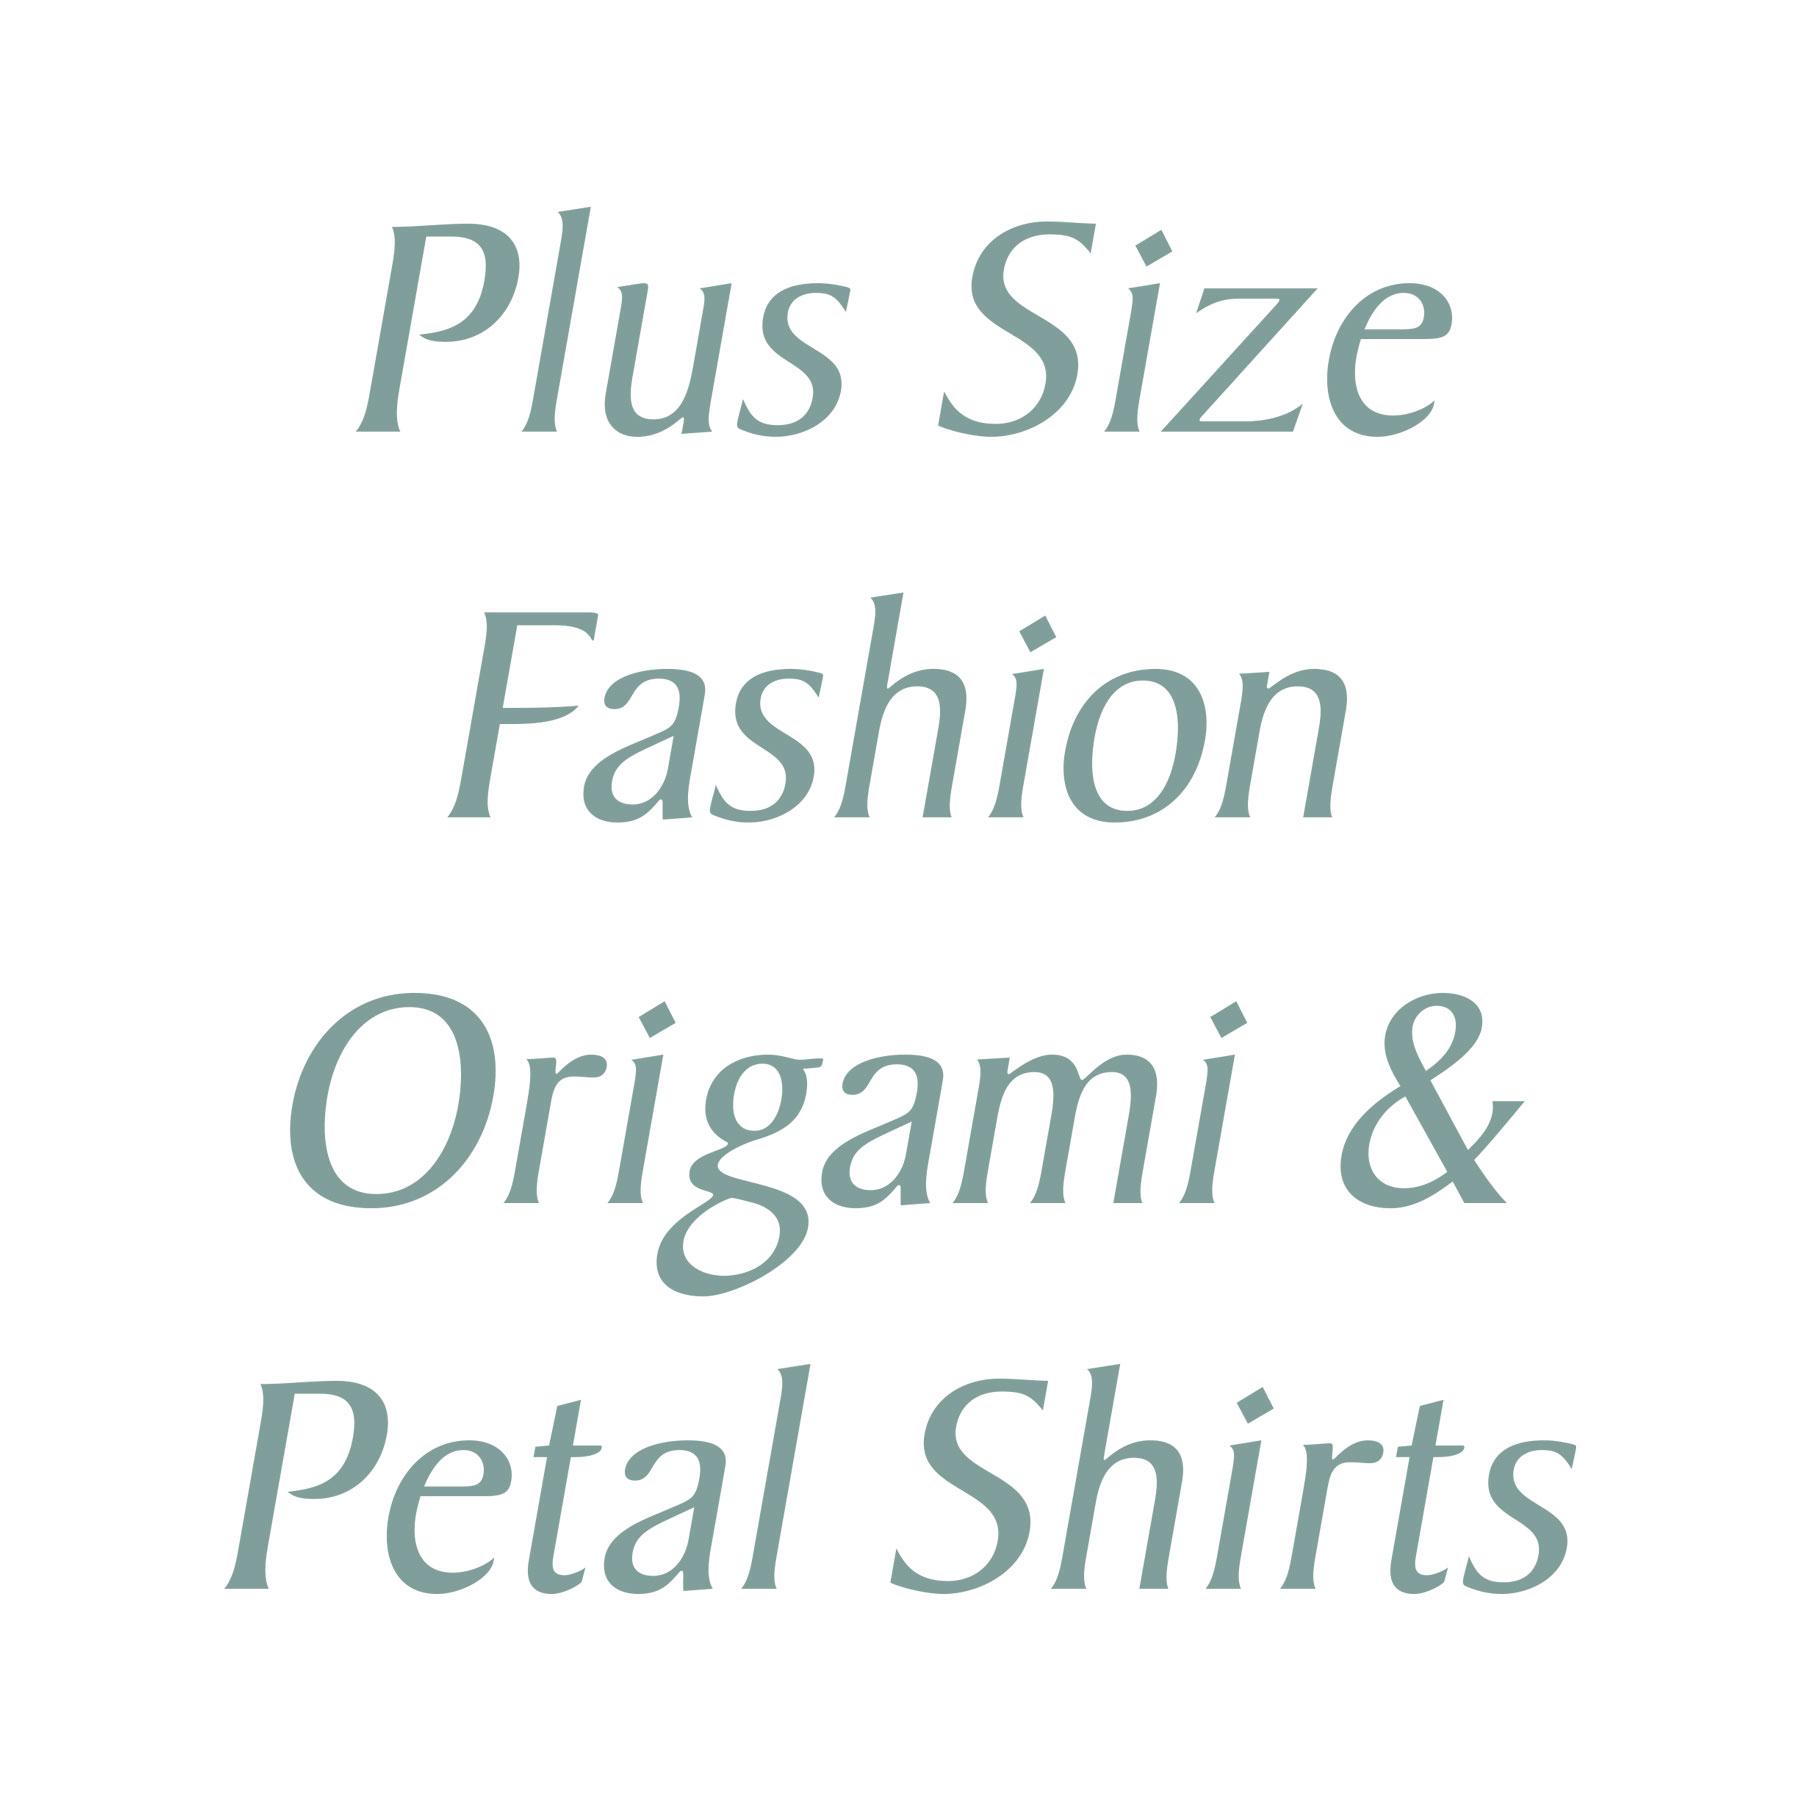 Origami and Petal Shirts